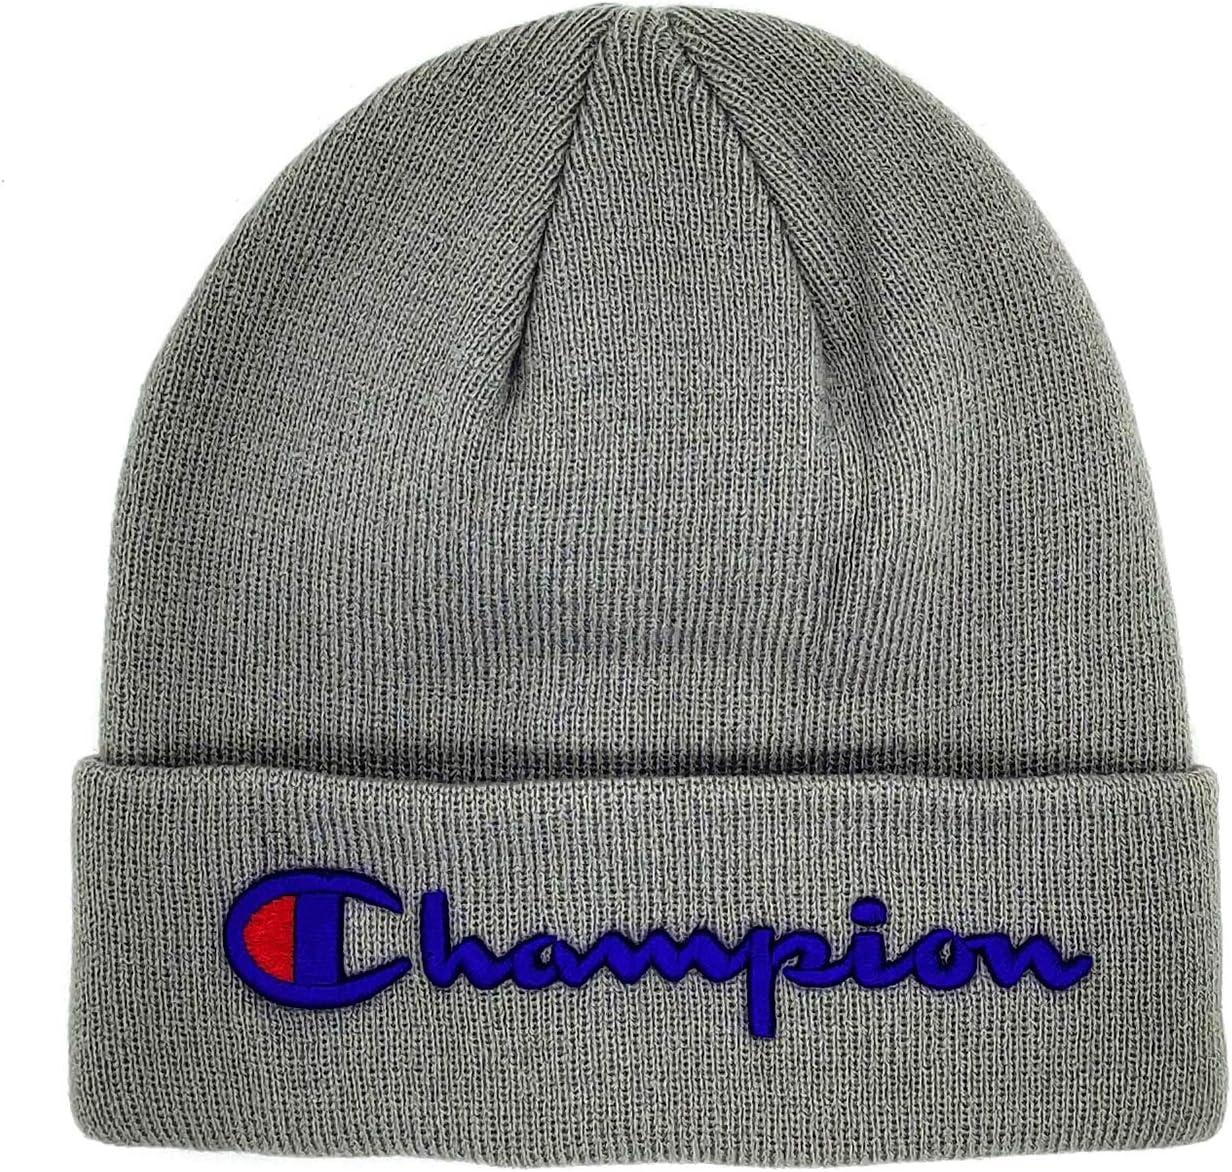 Champion Winter Beanie Skull Hat